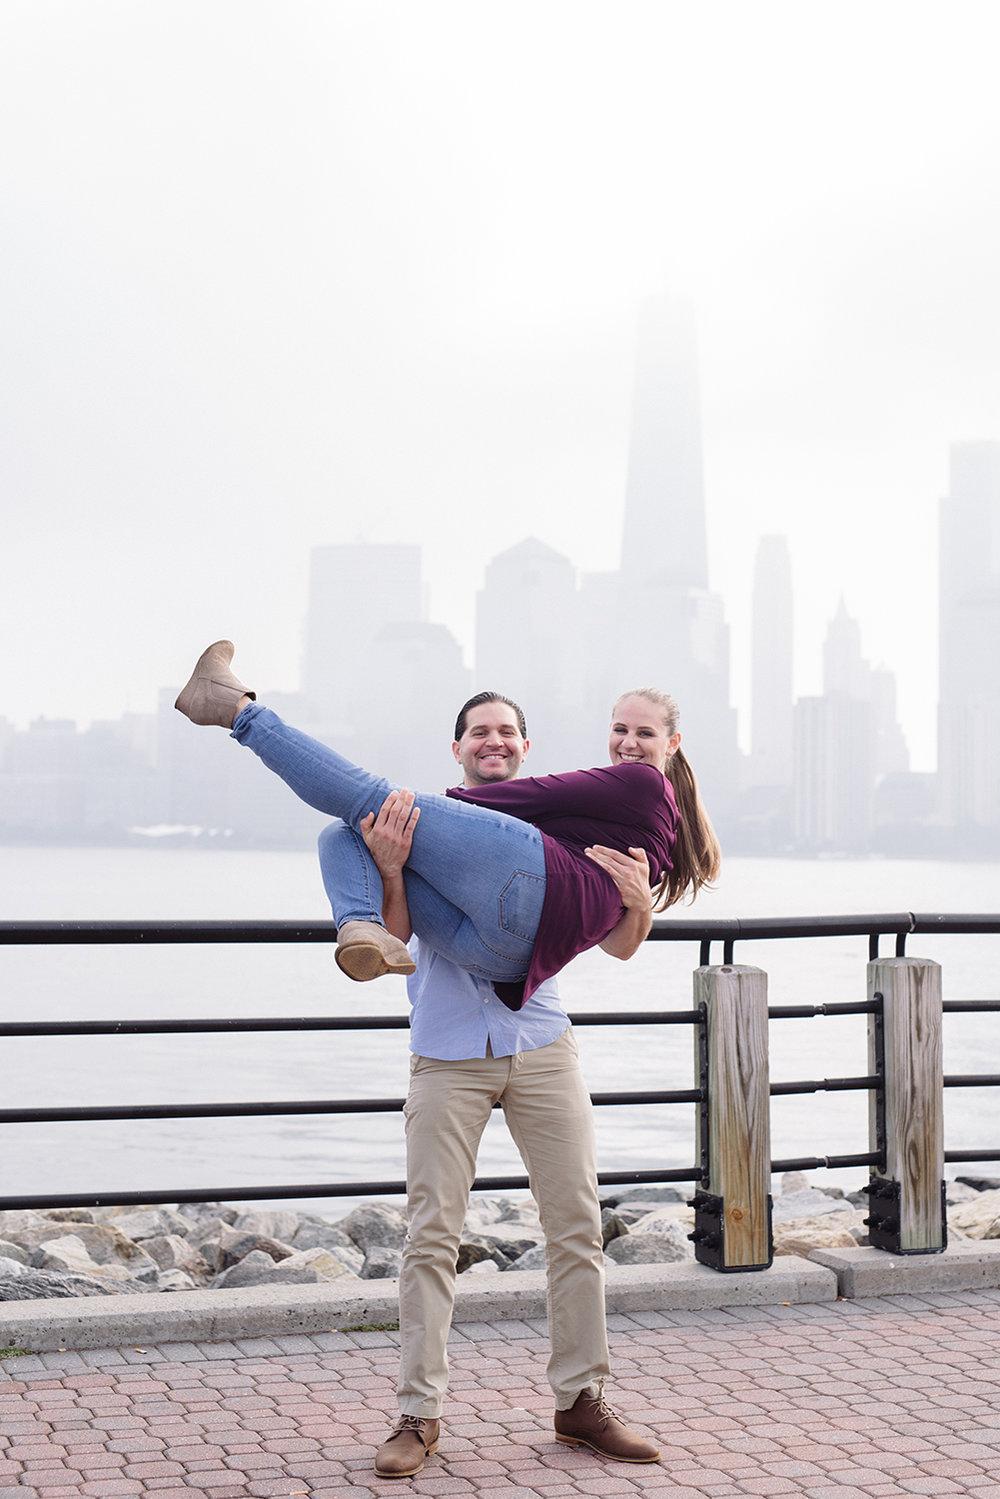 Layne+ Chris- Engagement Session- Liberty State Park- Jersey City New Jersey- Olivia Christina Photo-111.jpg